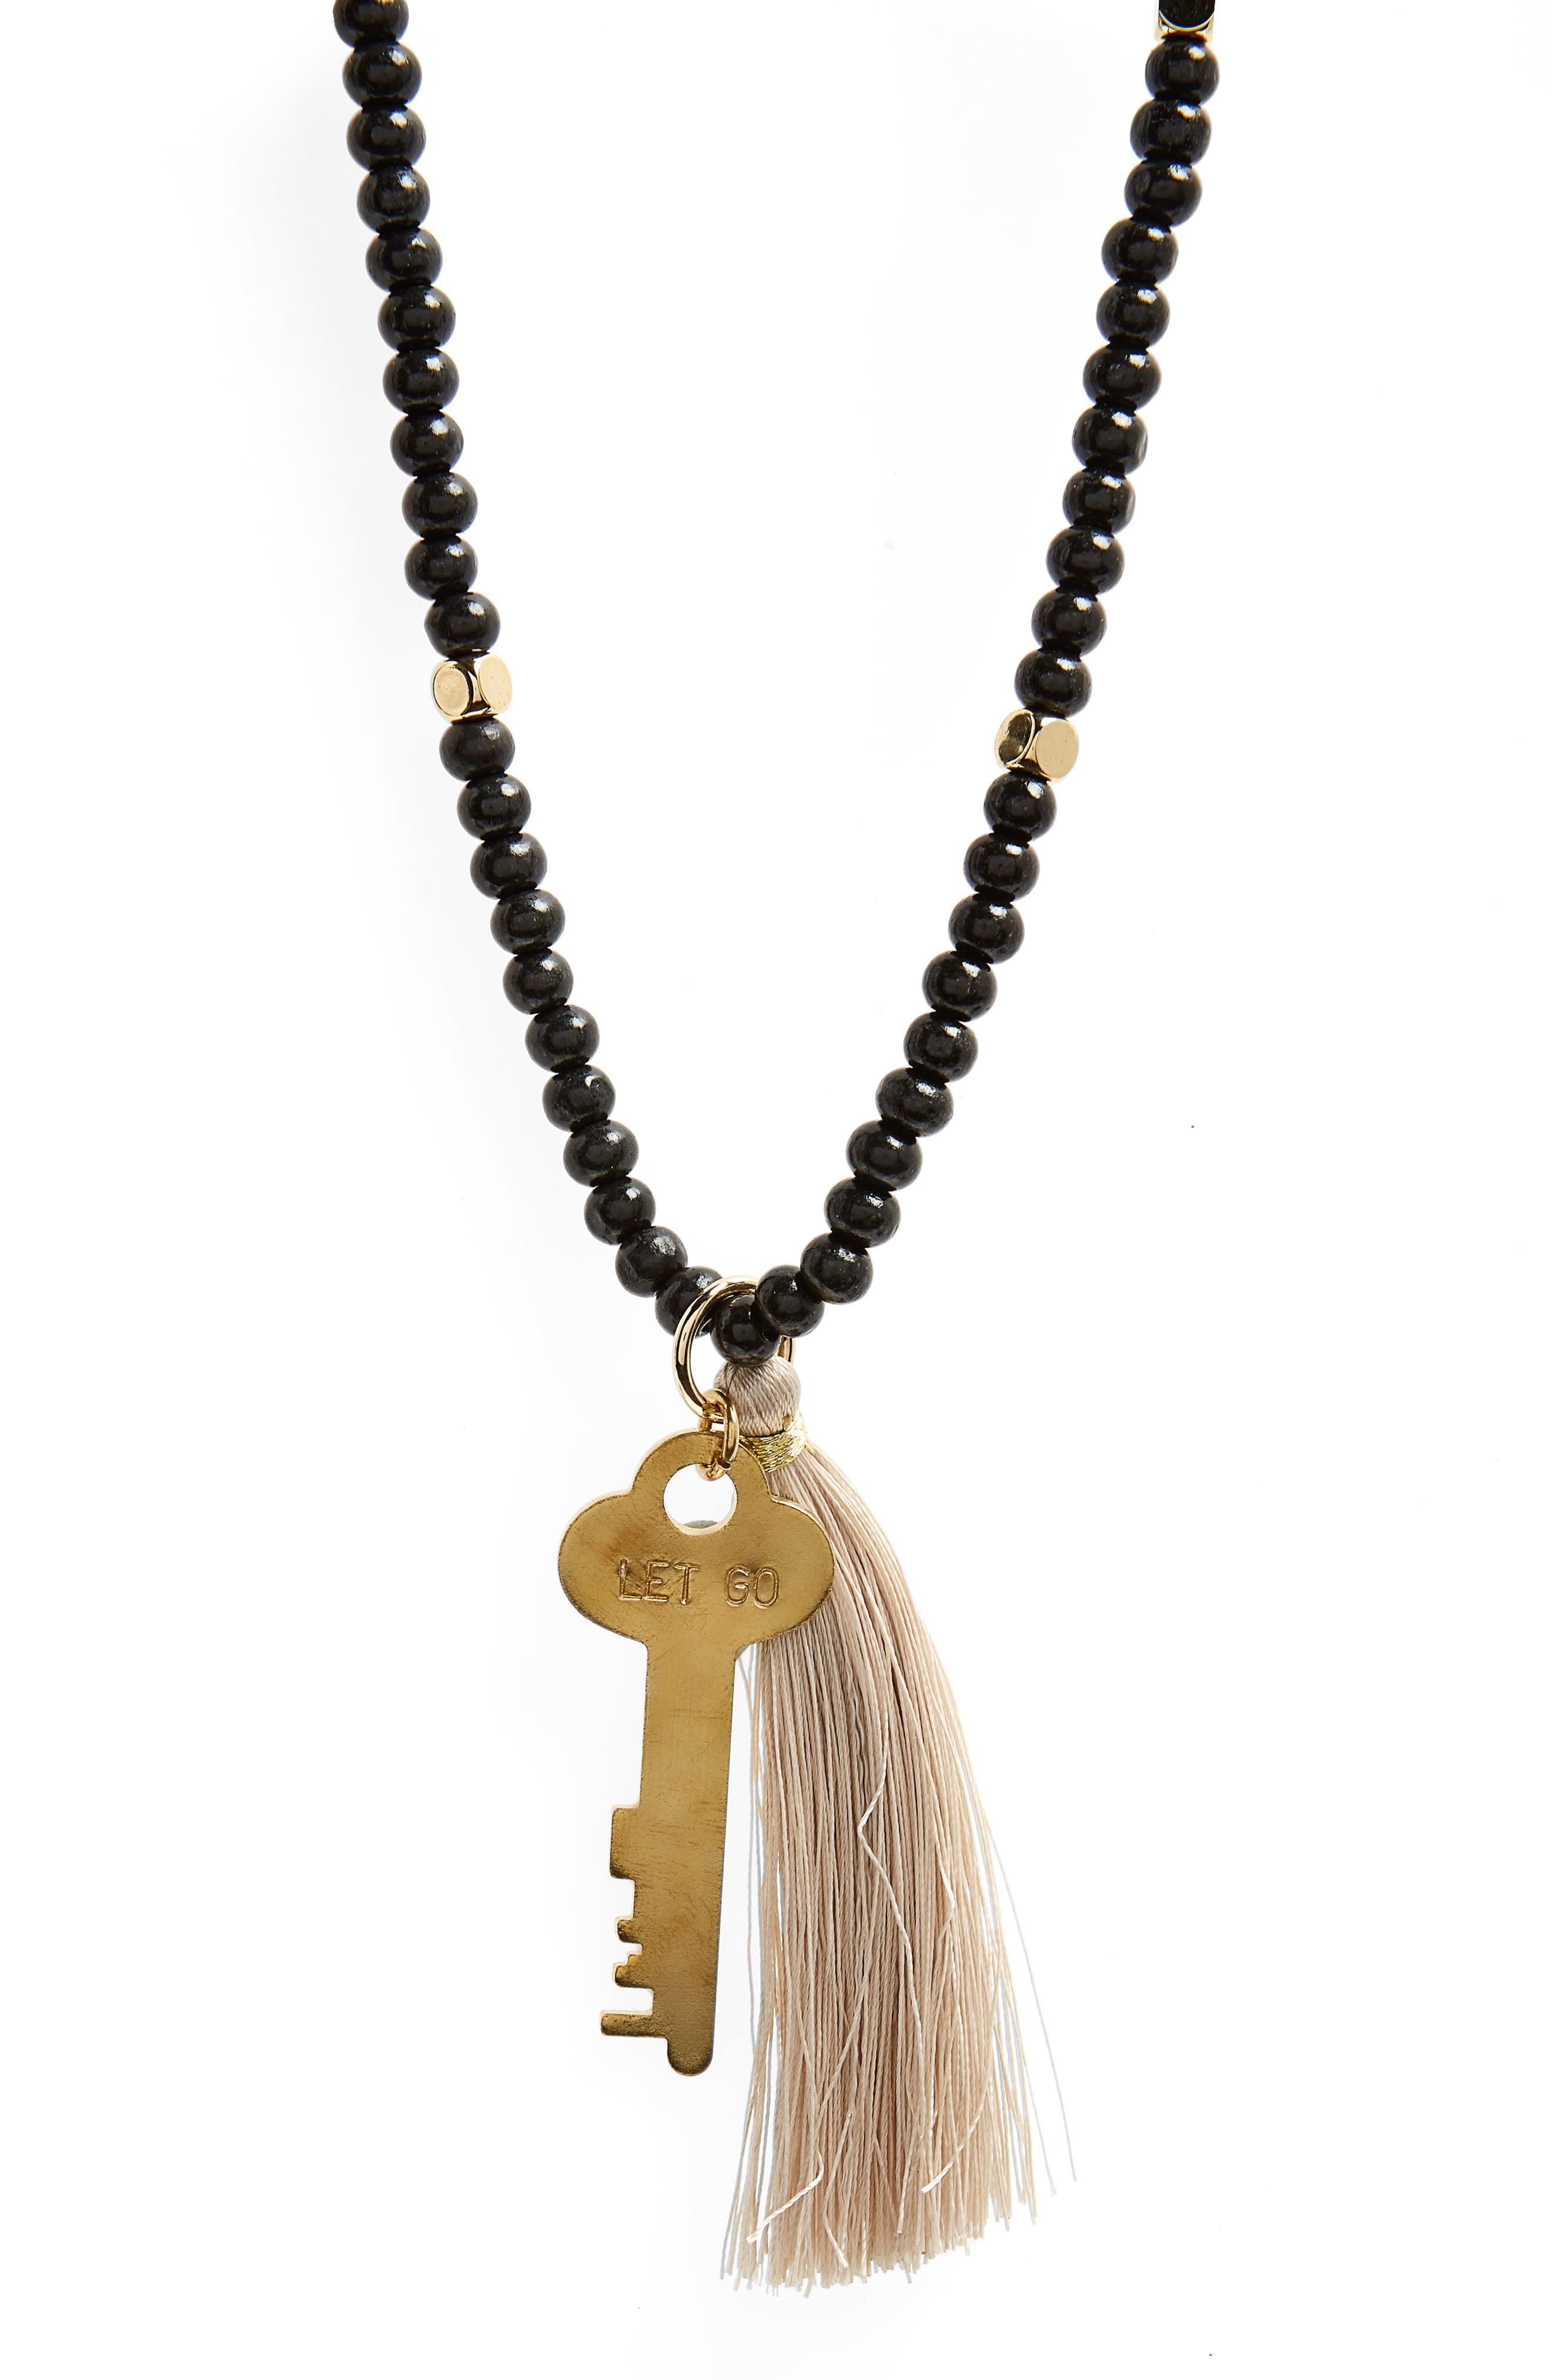 Inspiration Key Charm & Tassel Beaded Necklace,                             Alternate thumbnail 2, color,                             200